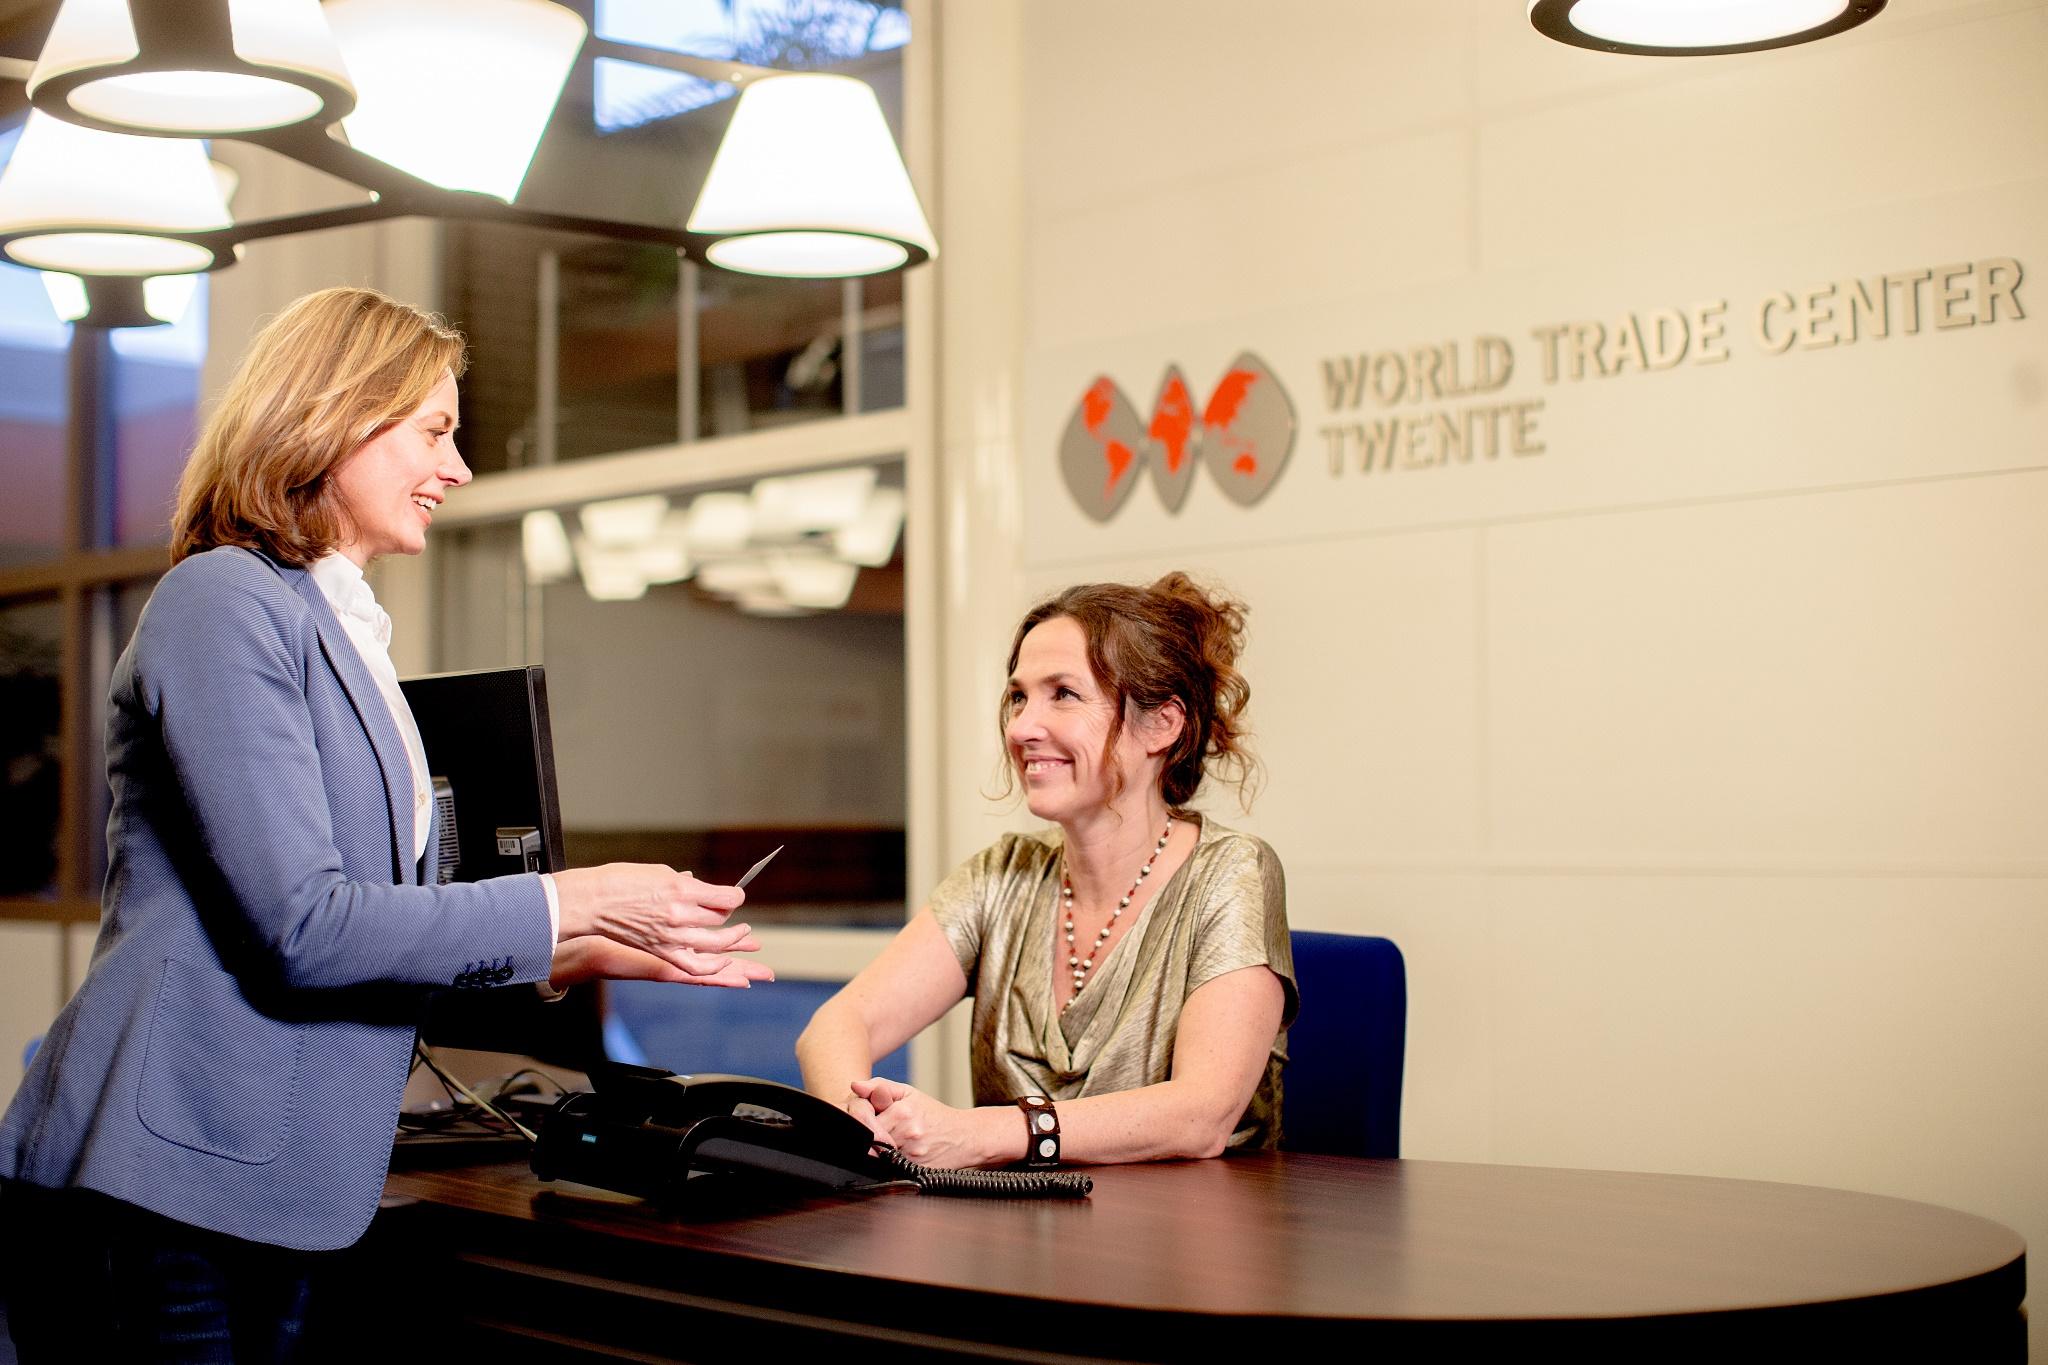 Make an Appointment - WTC Twente - photo#47